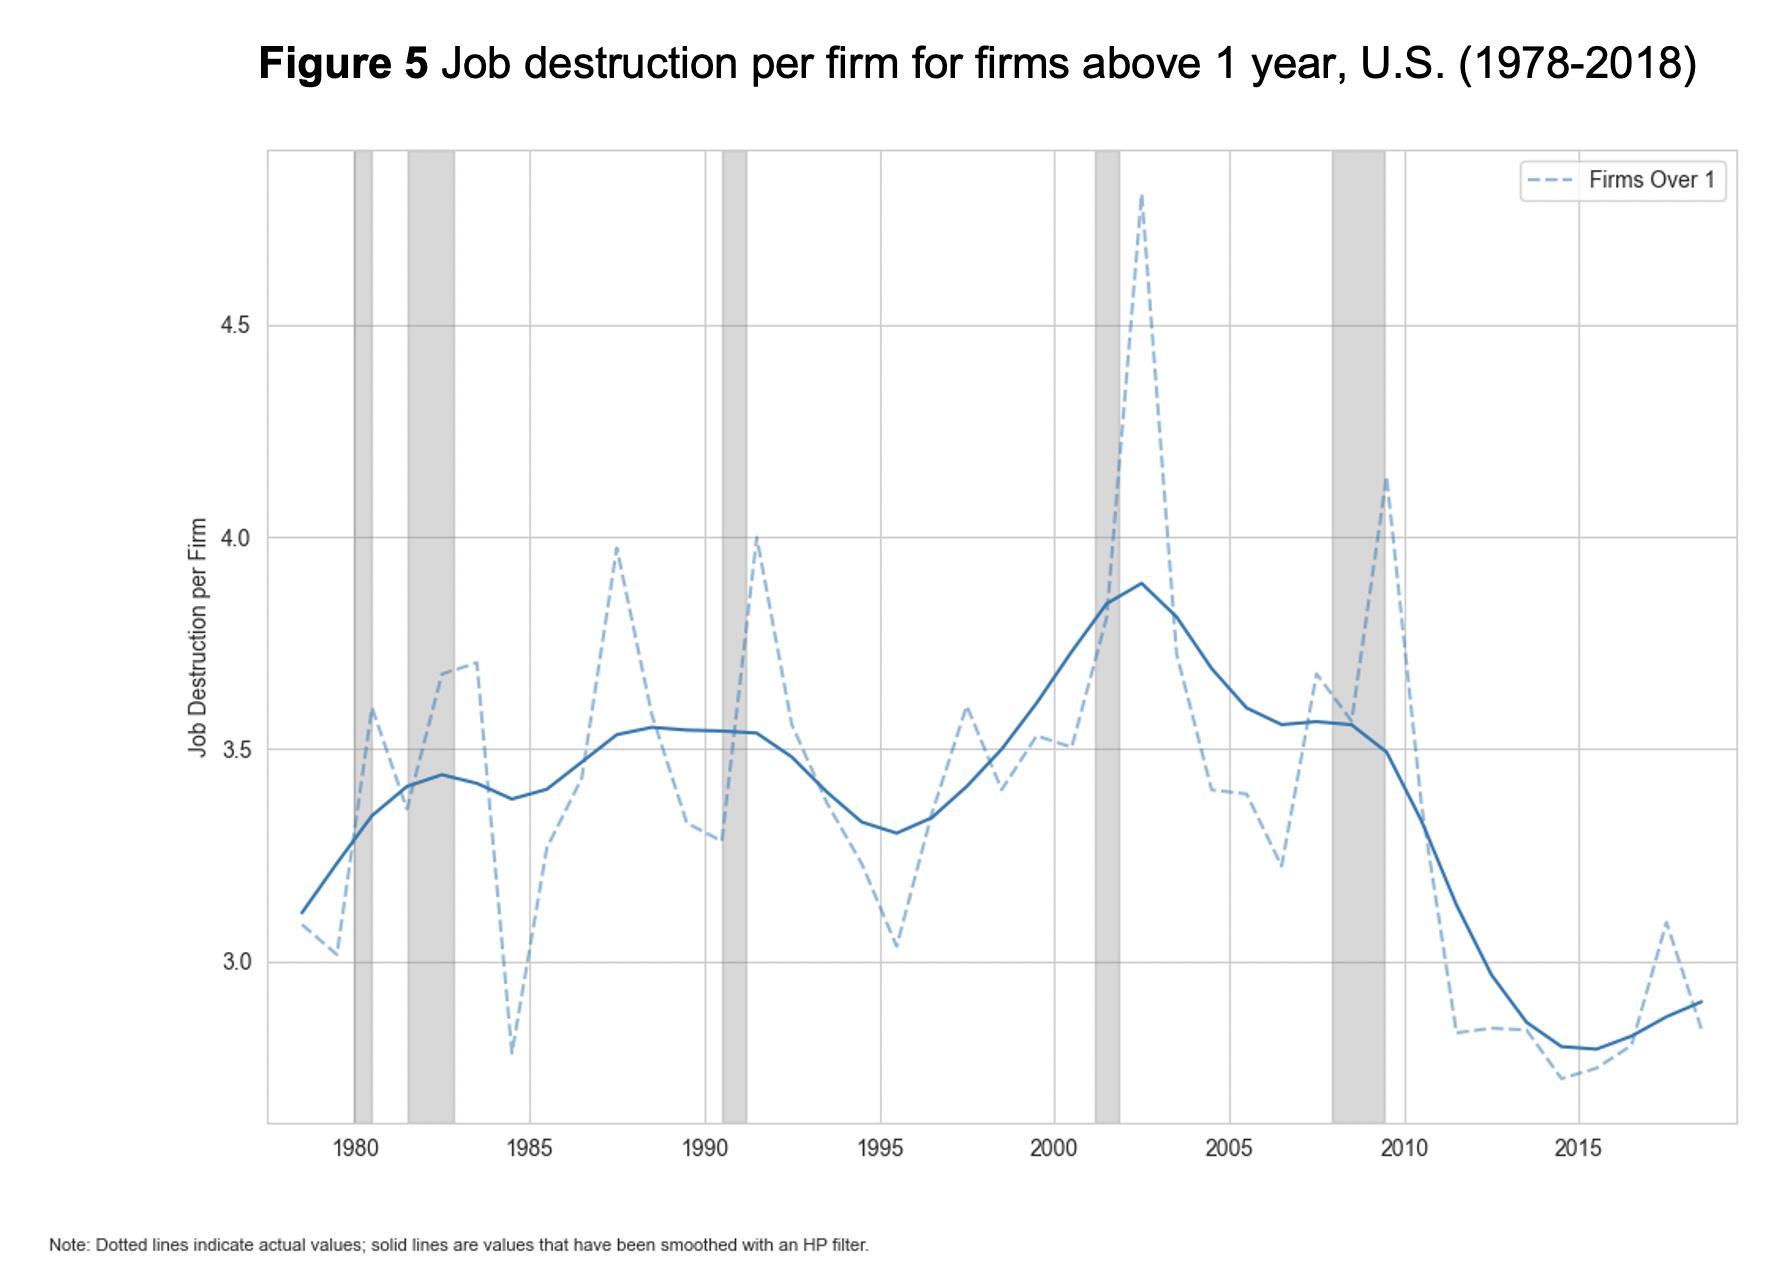 Figure 5: Job destruction per firm for firms above 1 year, U.S. (1978-2018)